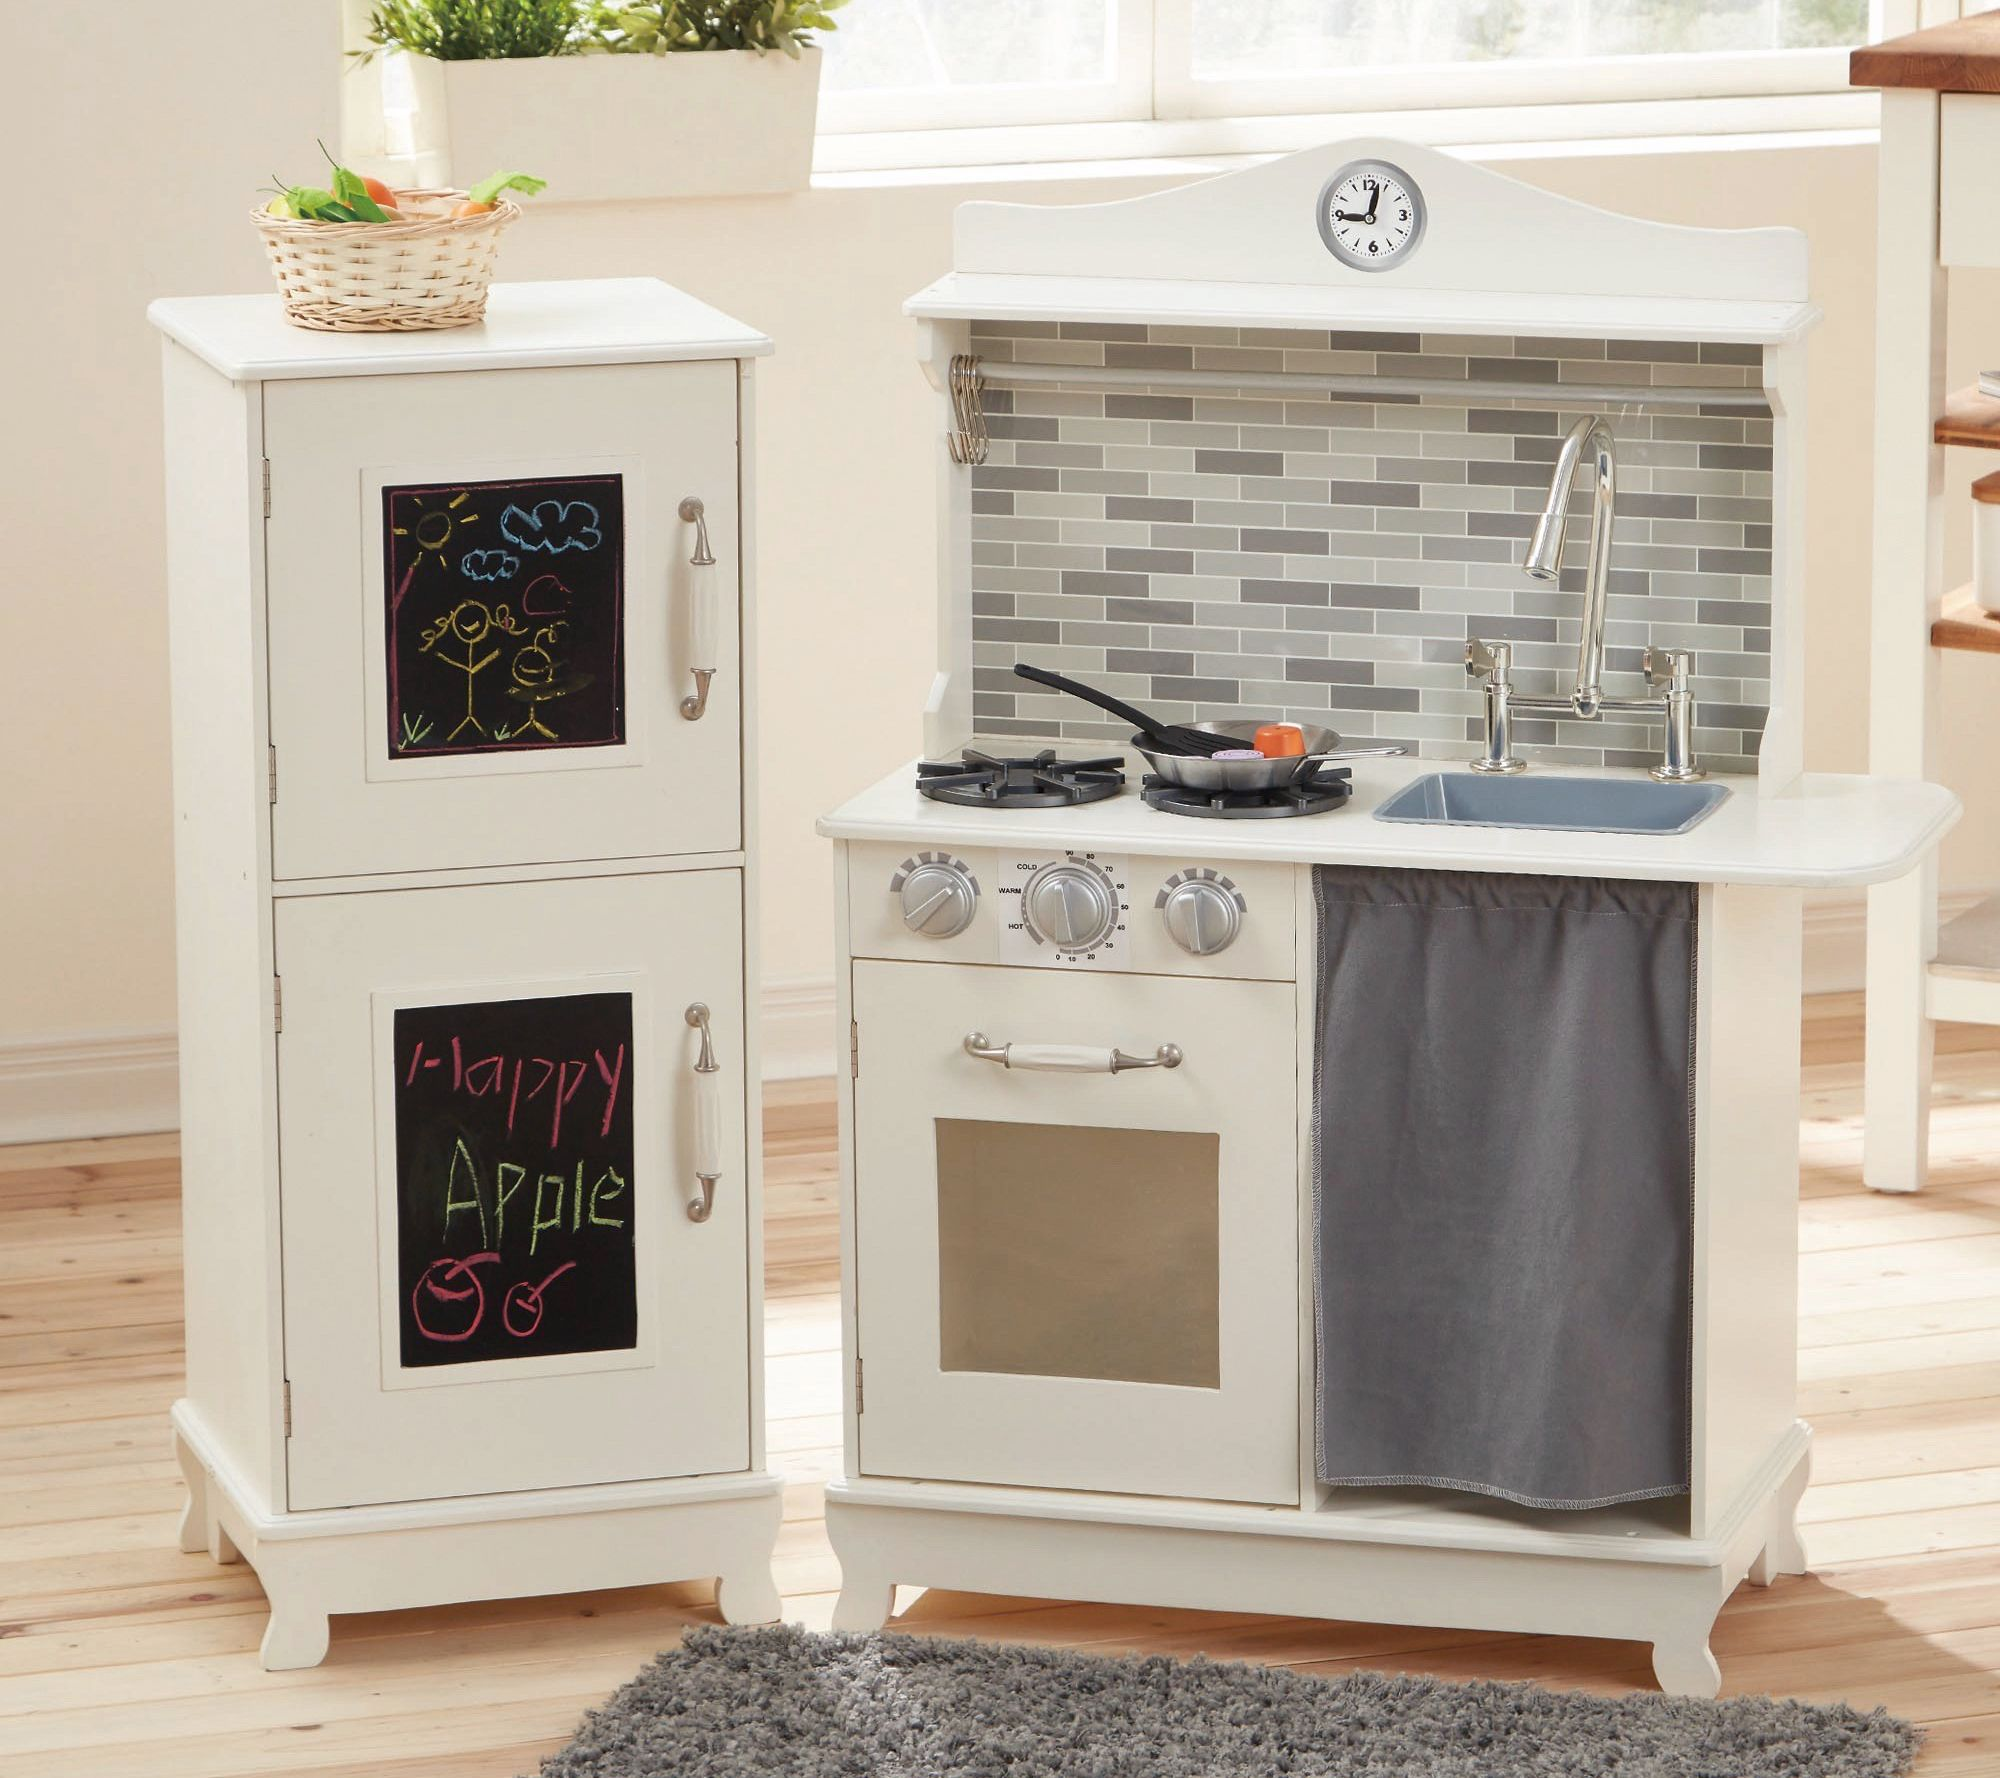 Teamson Kids Farmhouse Kitchen with Stove & Refrigerator — QVC.com